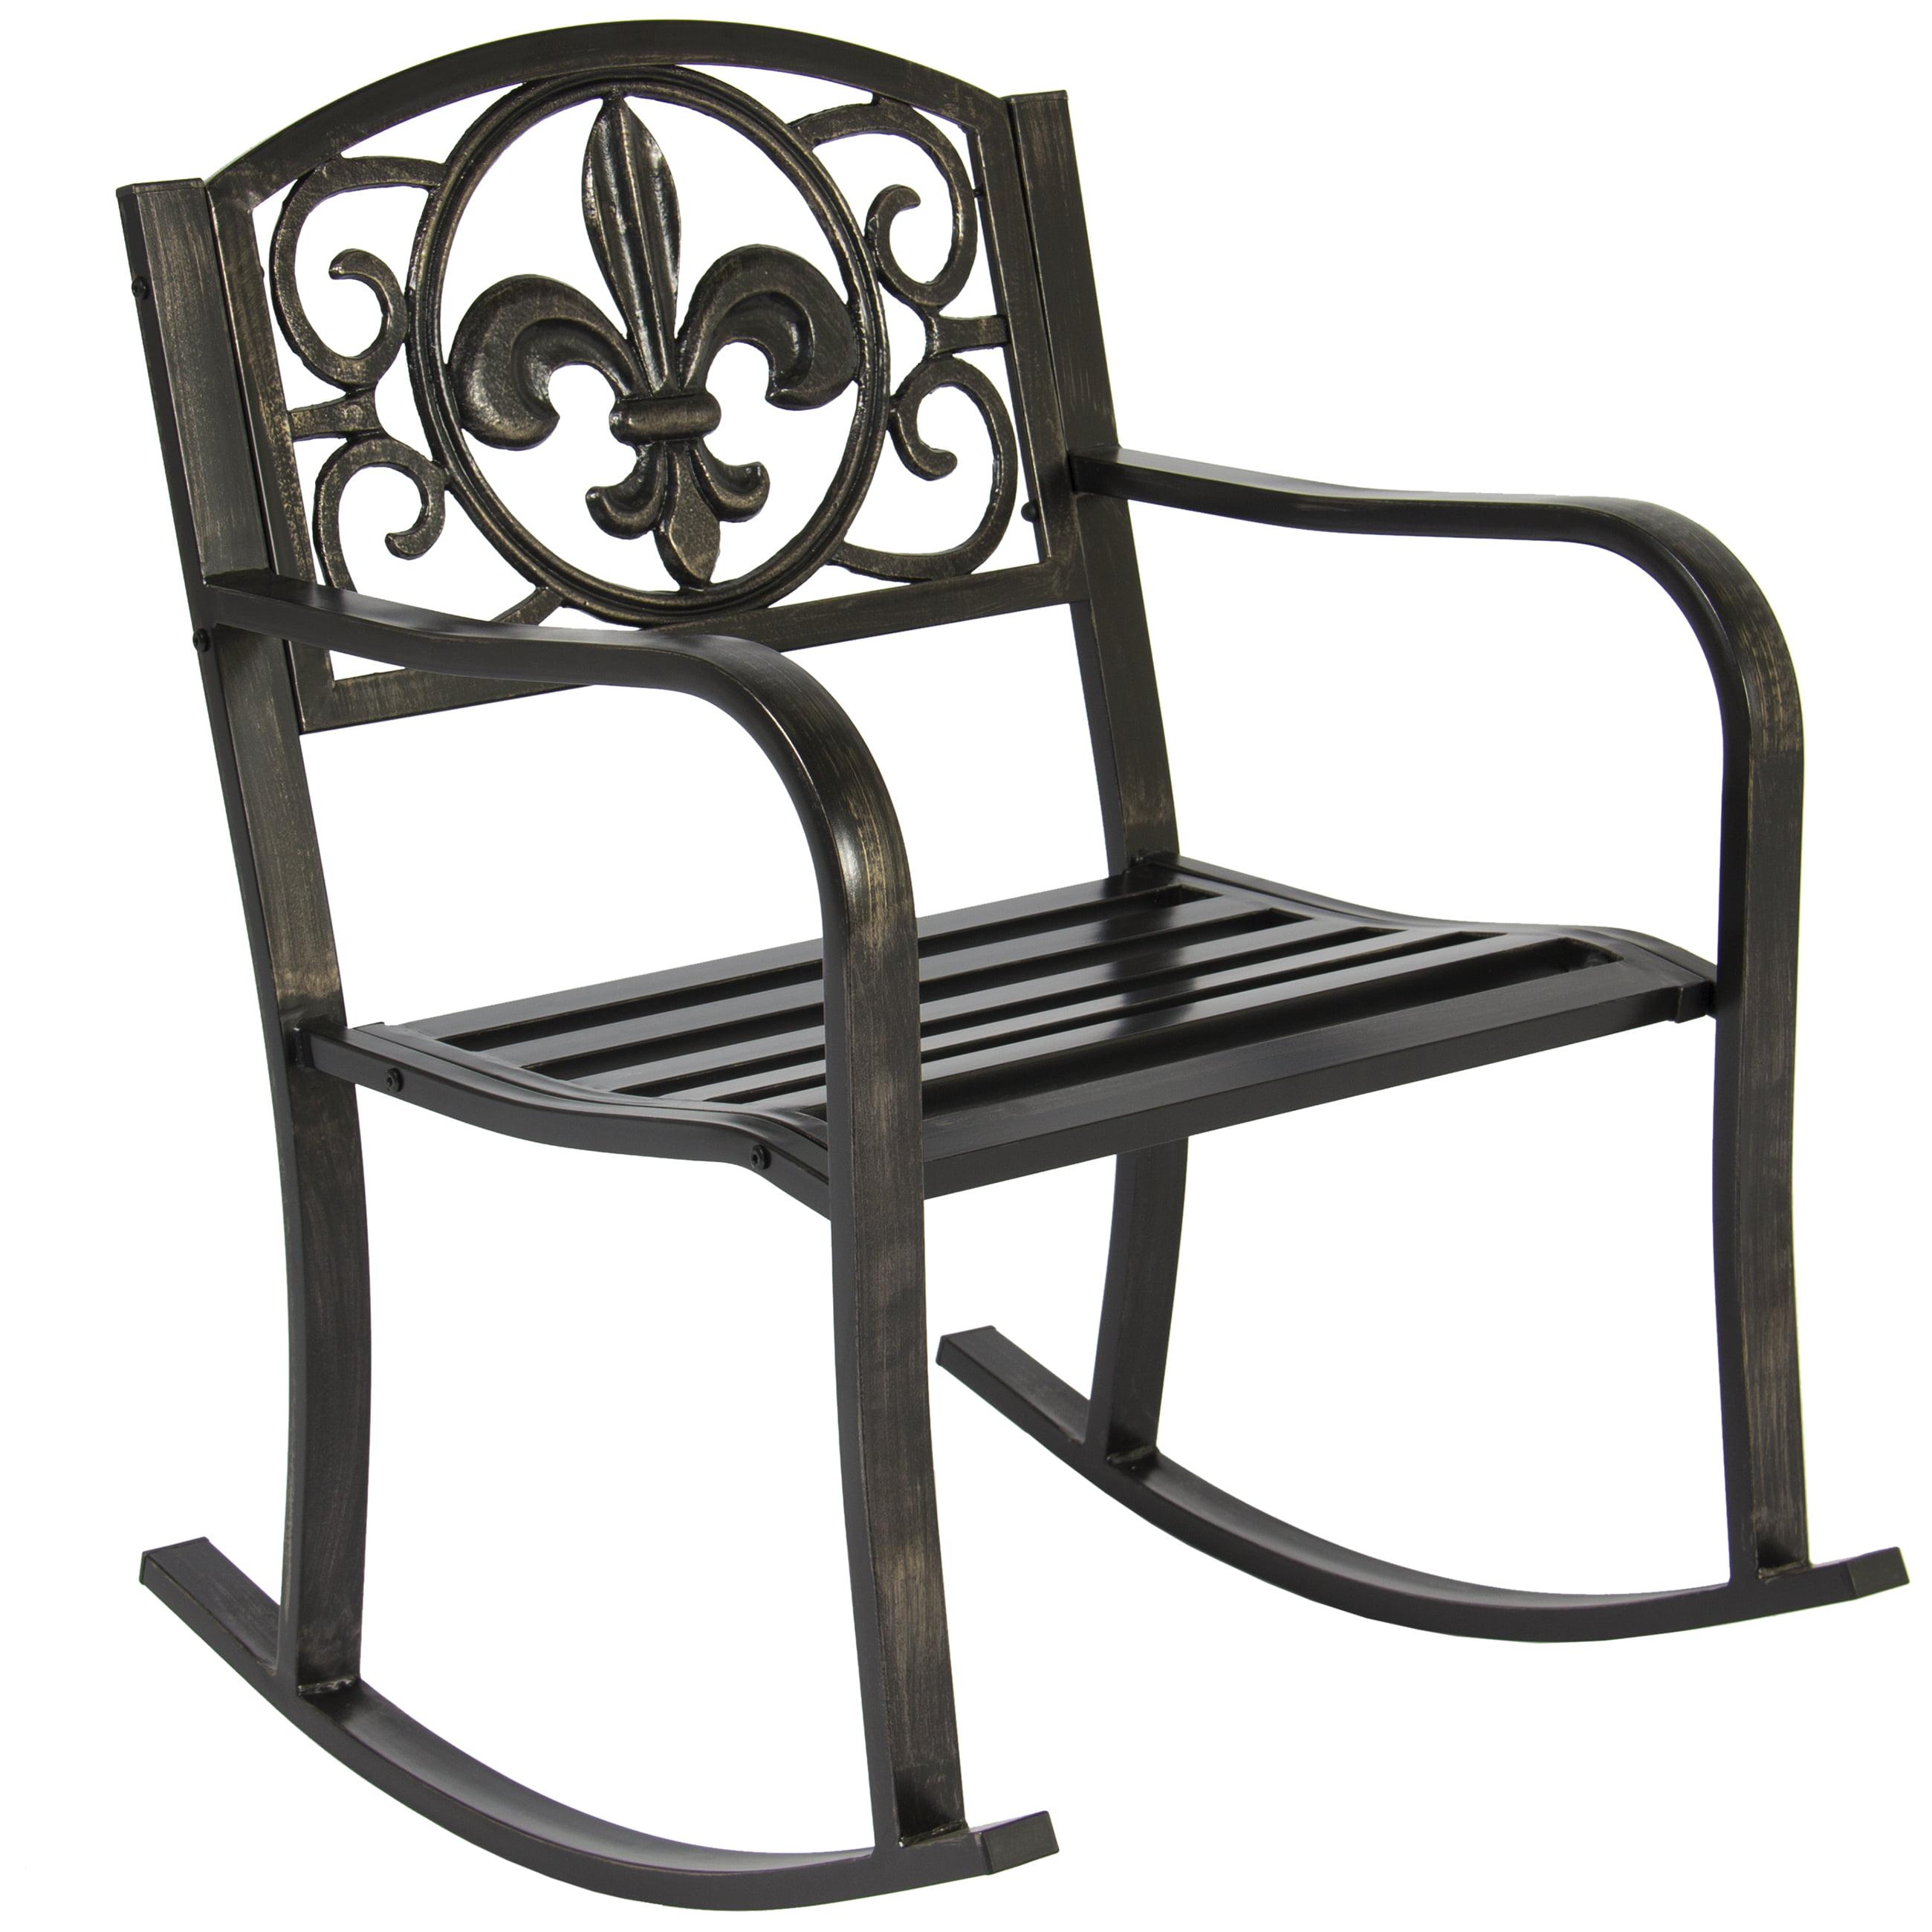 Phenomenal Patio Metal Rocking Chair Porch Seat Deck Outdoor Backyard Glider Rocker Bralicious Painted Fabric Chair Ideas Braliciousco